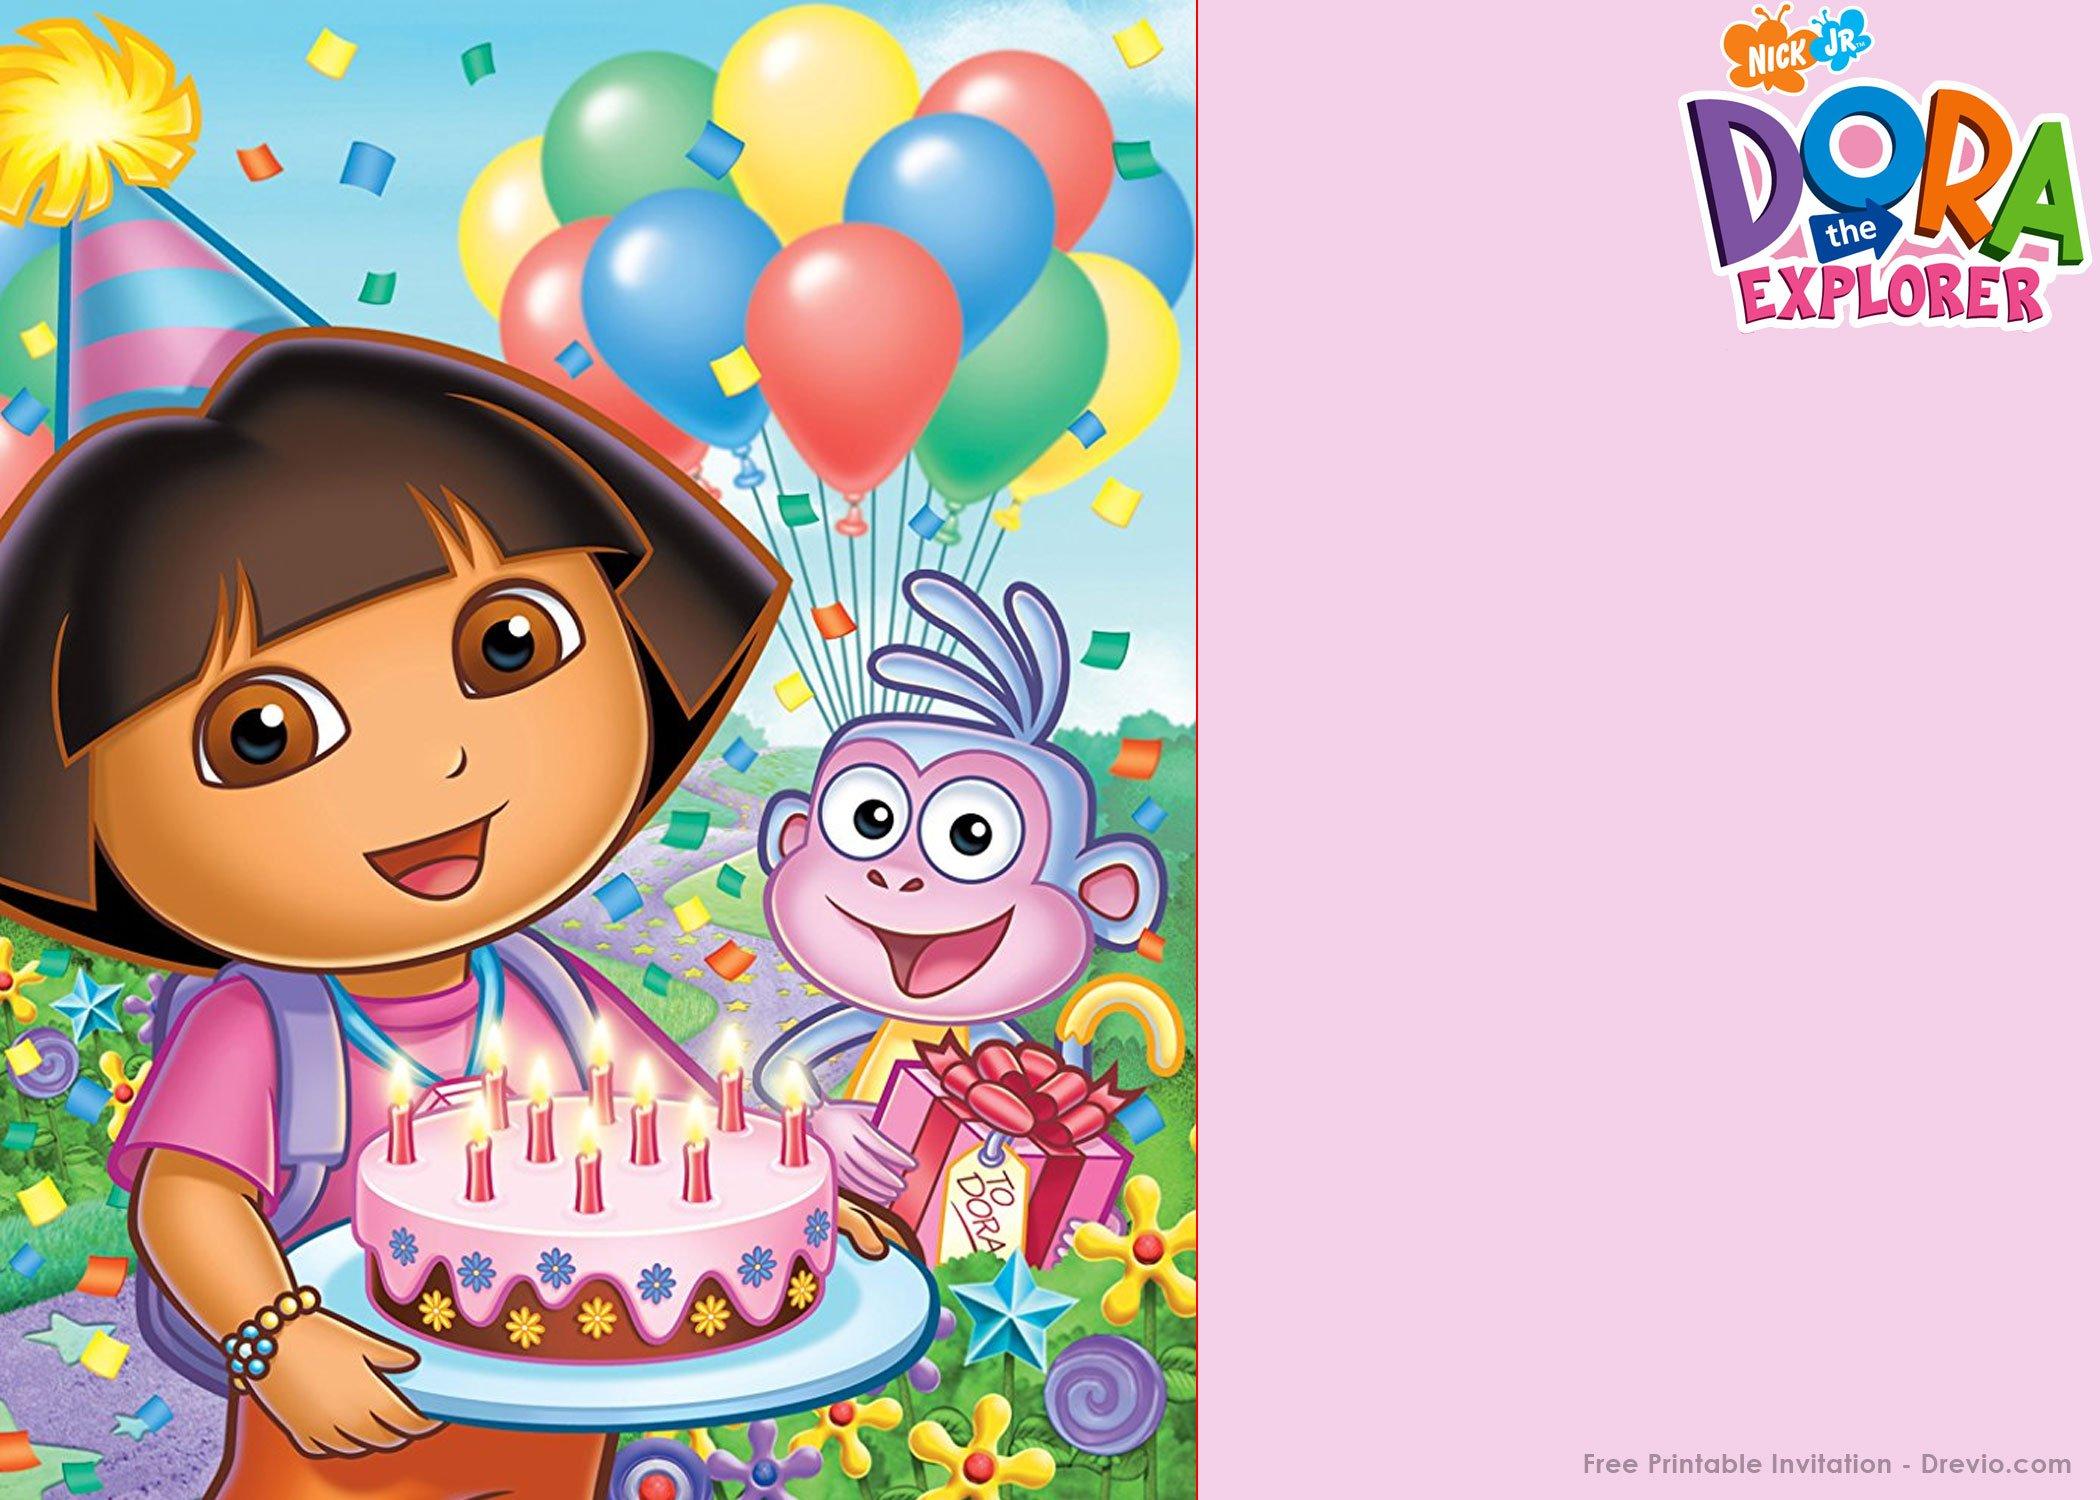 Free Printable Dora The Explorer Party Invitation Template